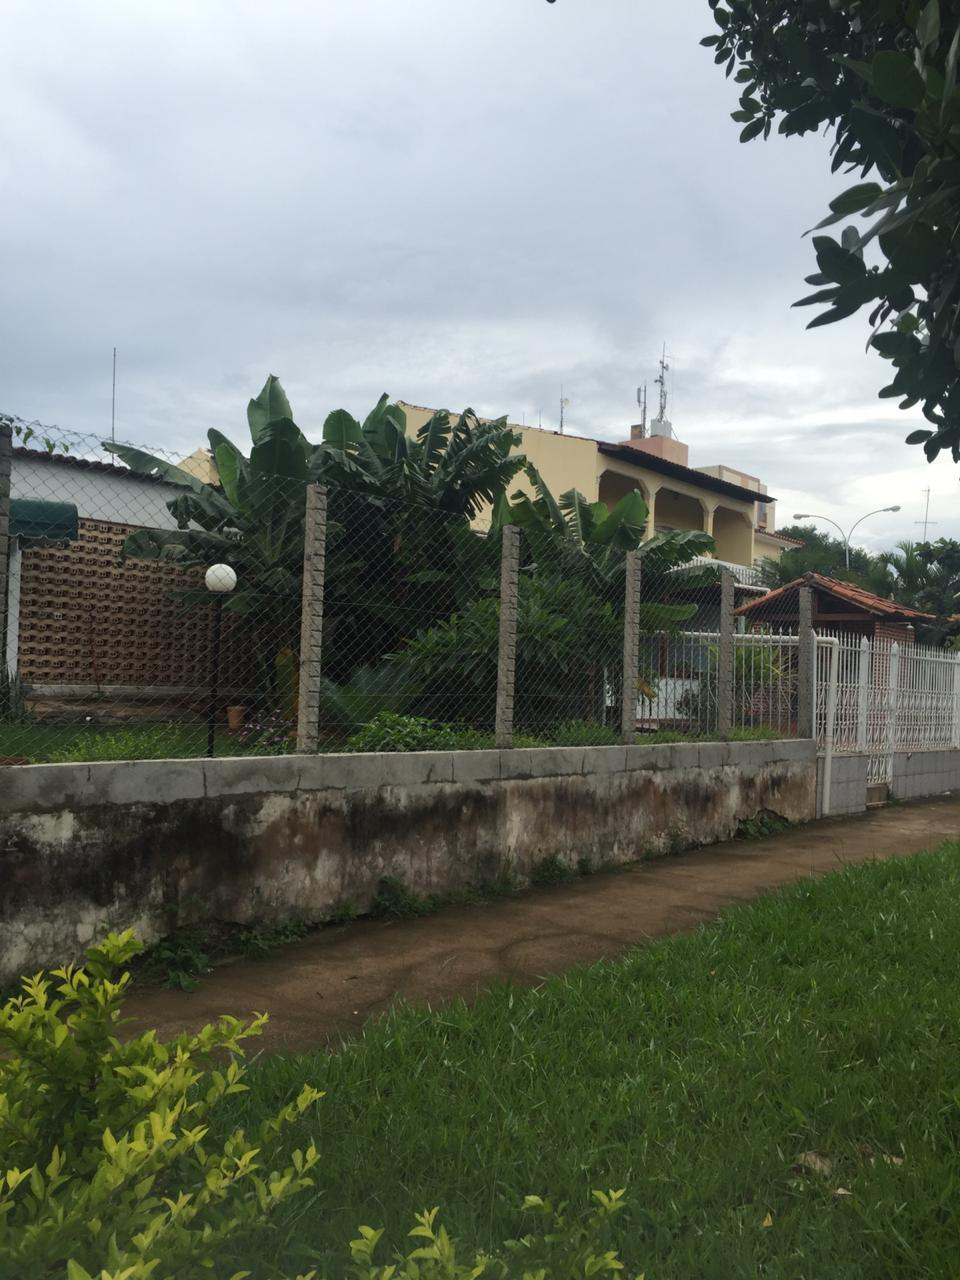 BRA – Casa/Terreno em Brasília – DF